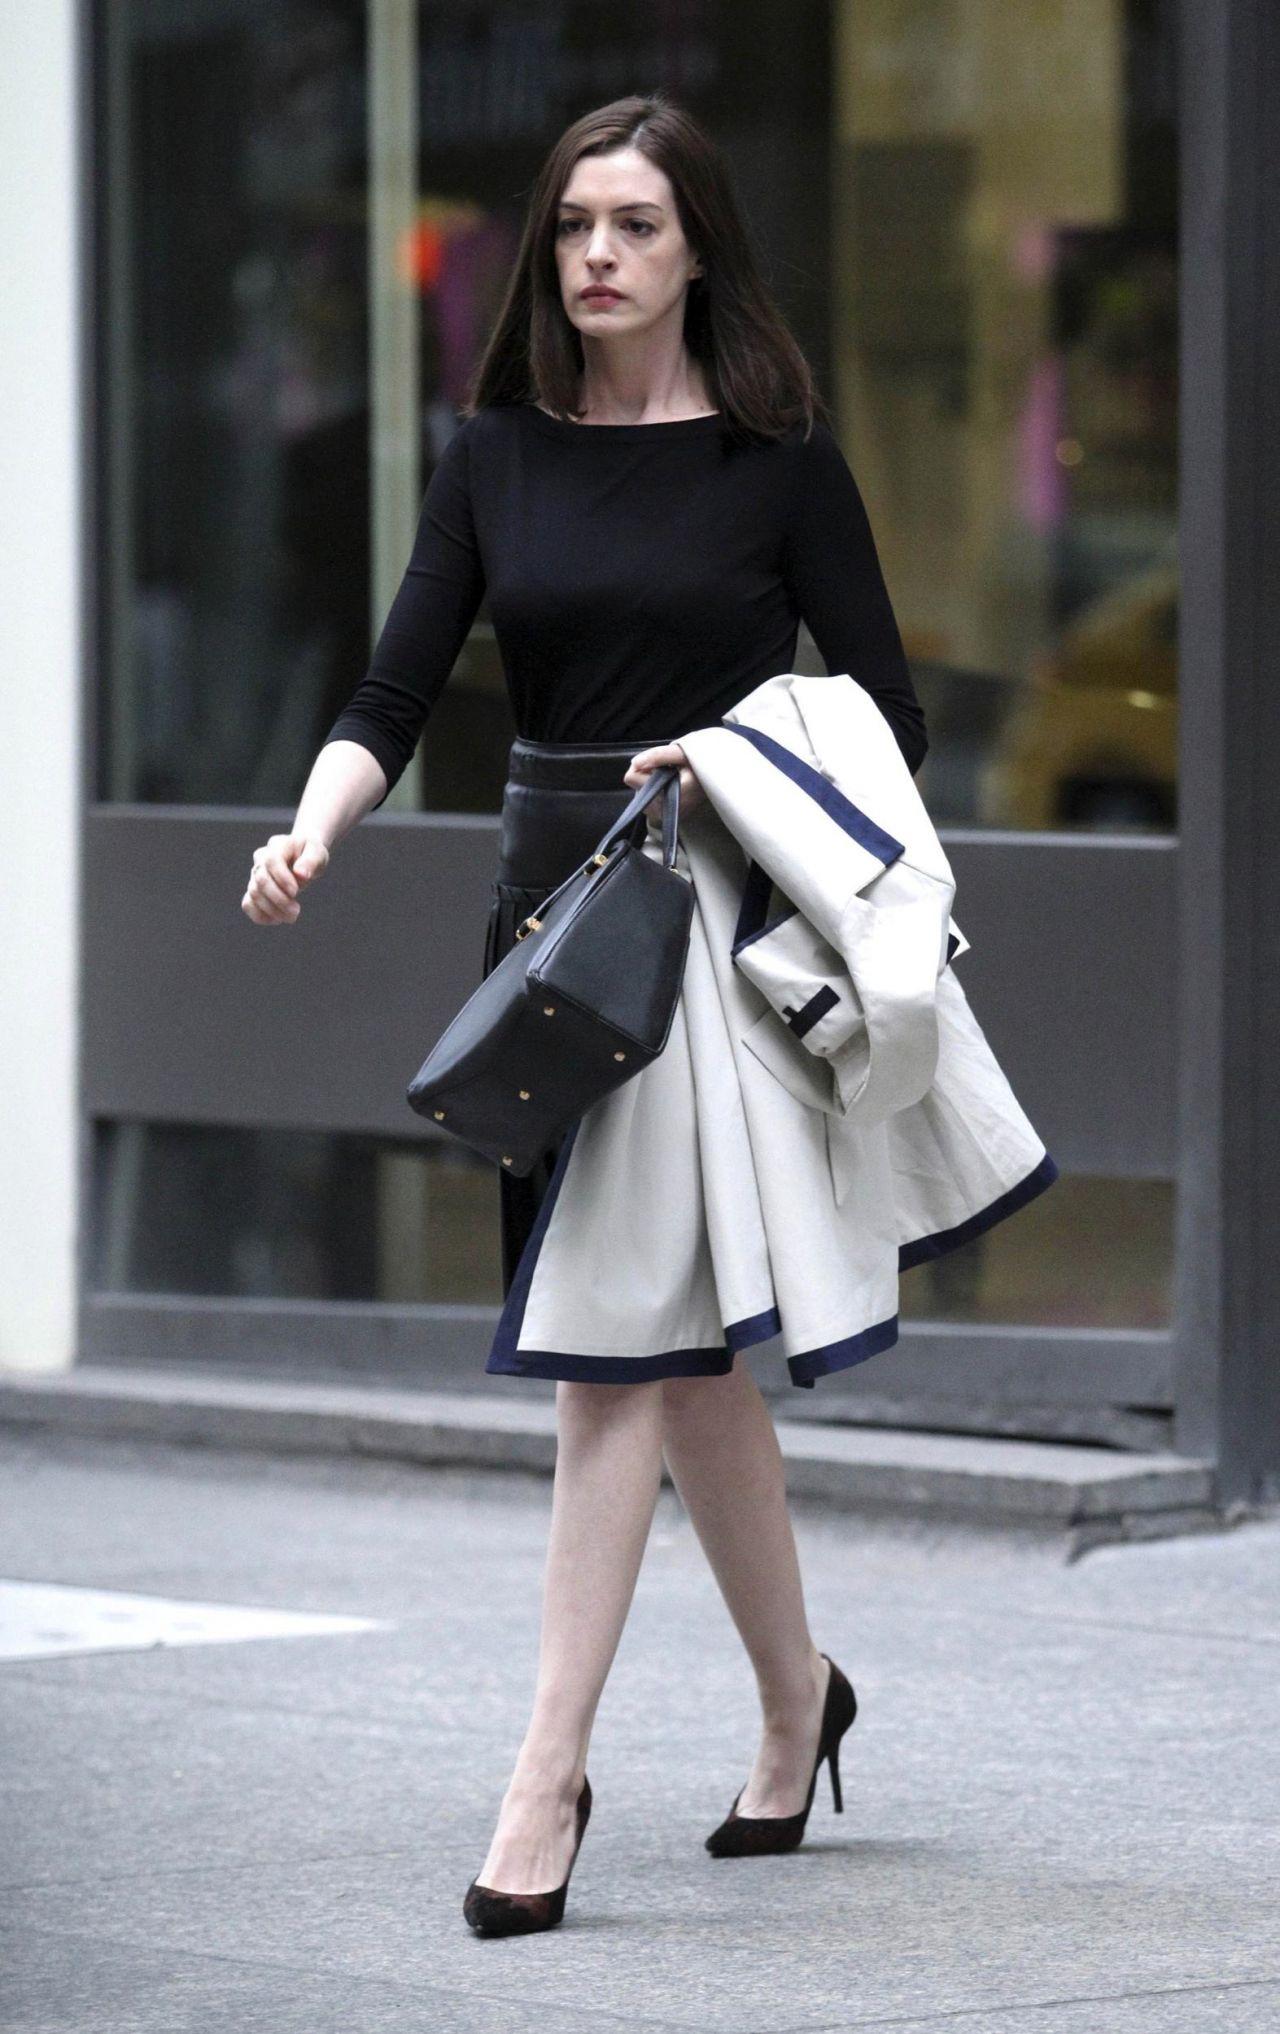 Anne Hathaway Leggy